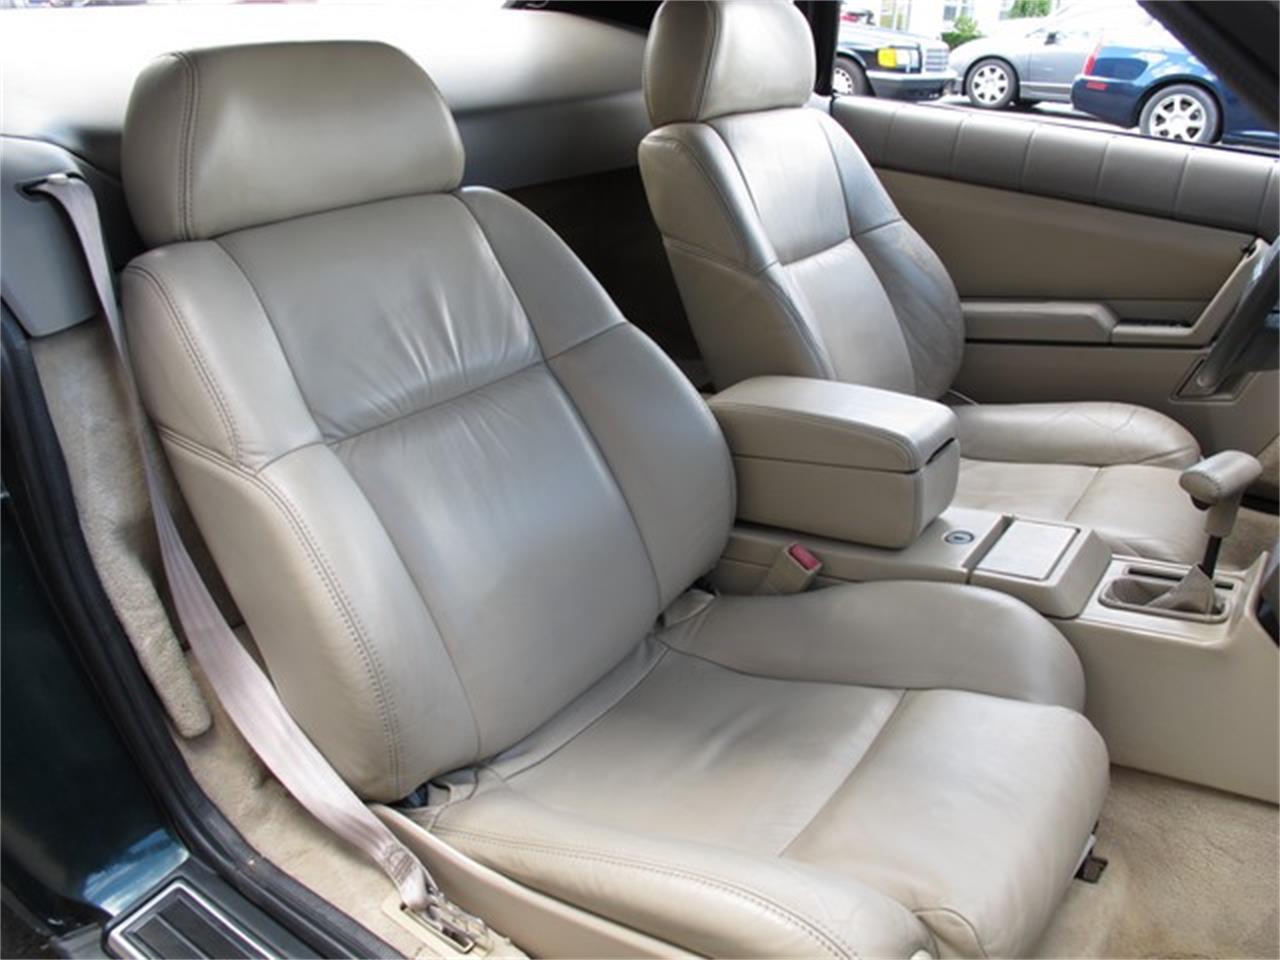 Large Picture of '93 Cadillac Allante - $14,900.00 - IQM6